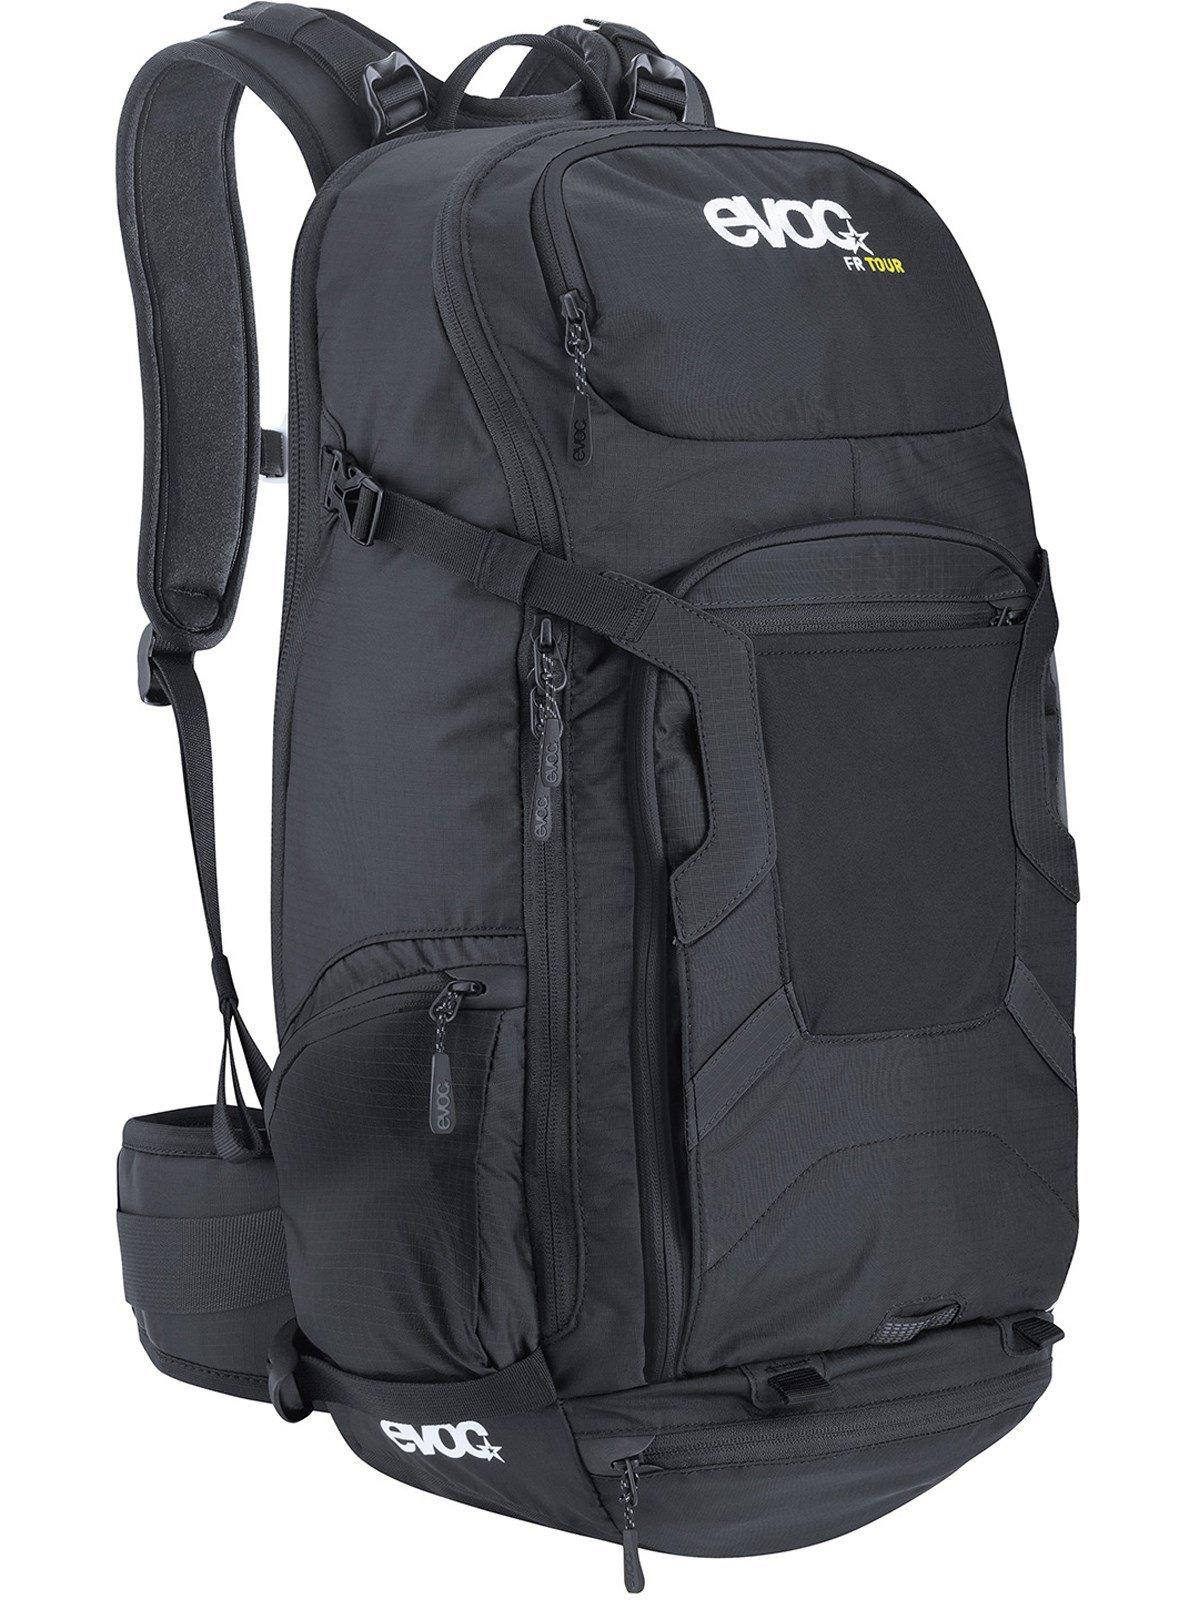 Evoc FR Tour Protector Hydration Pack Black, M/L